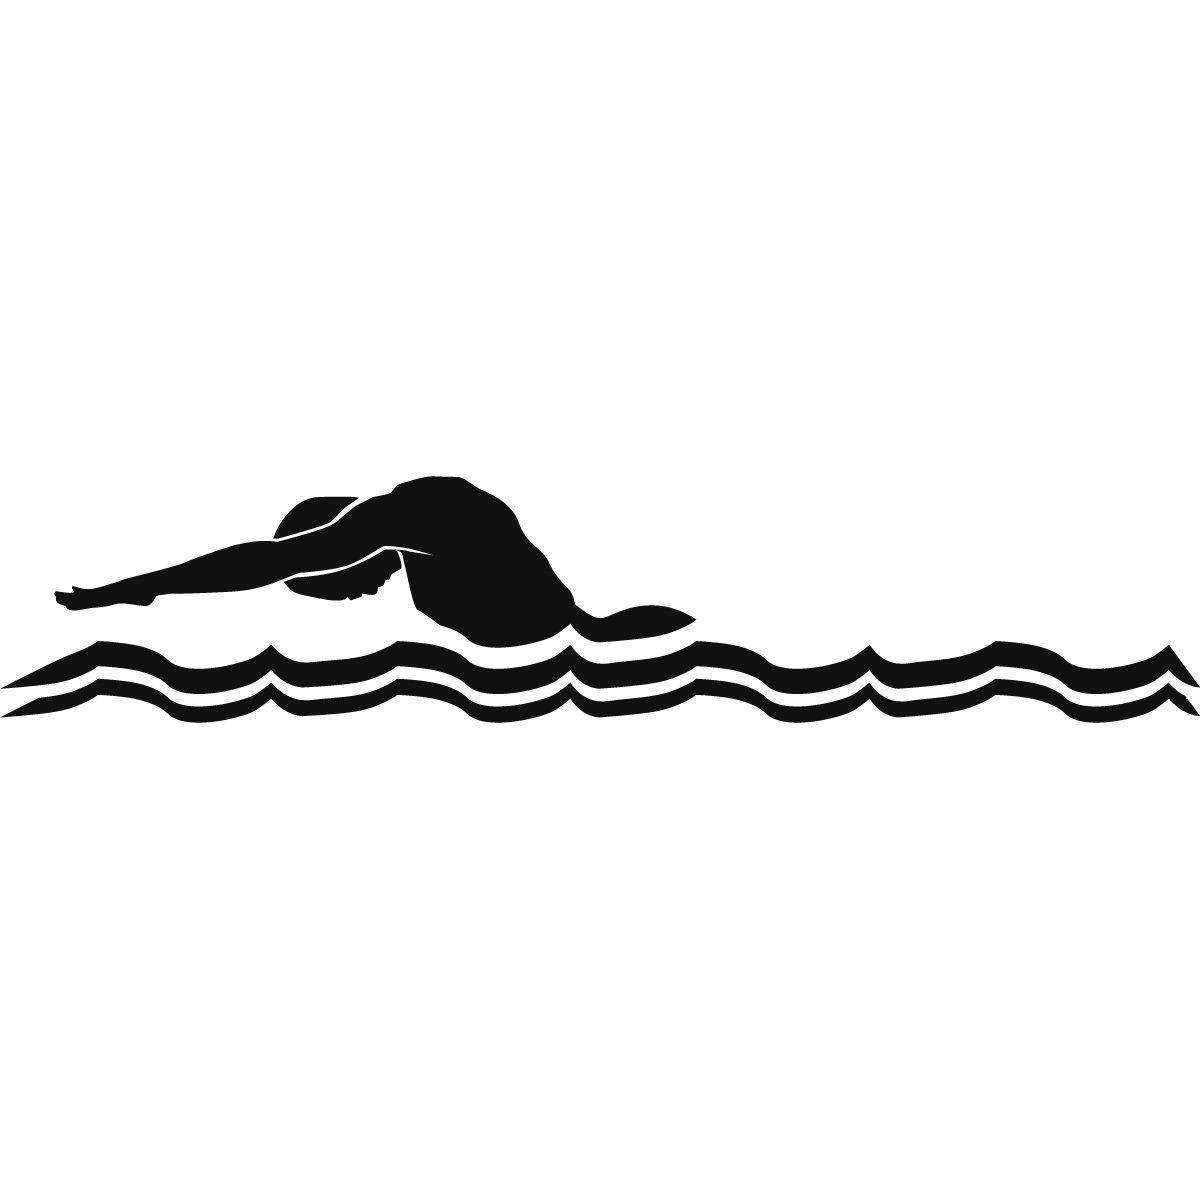 hight resolution of clip art male swimmer butterfly stroke green swimming